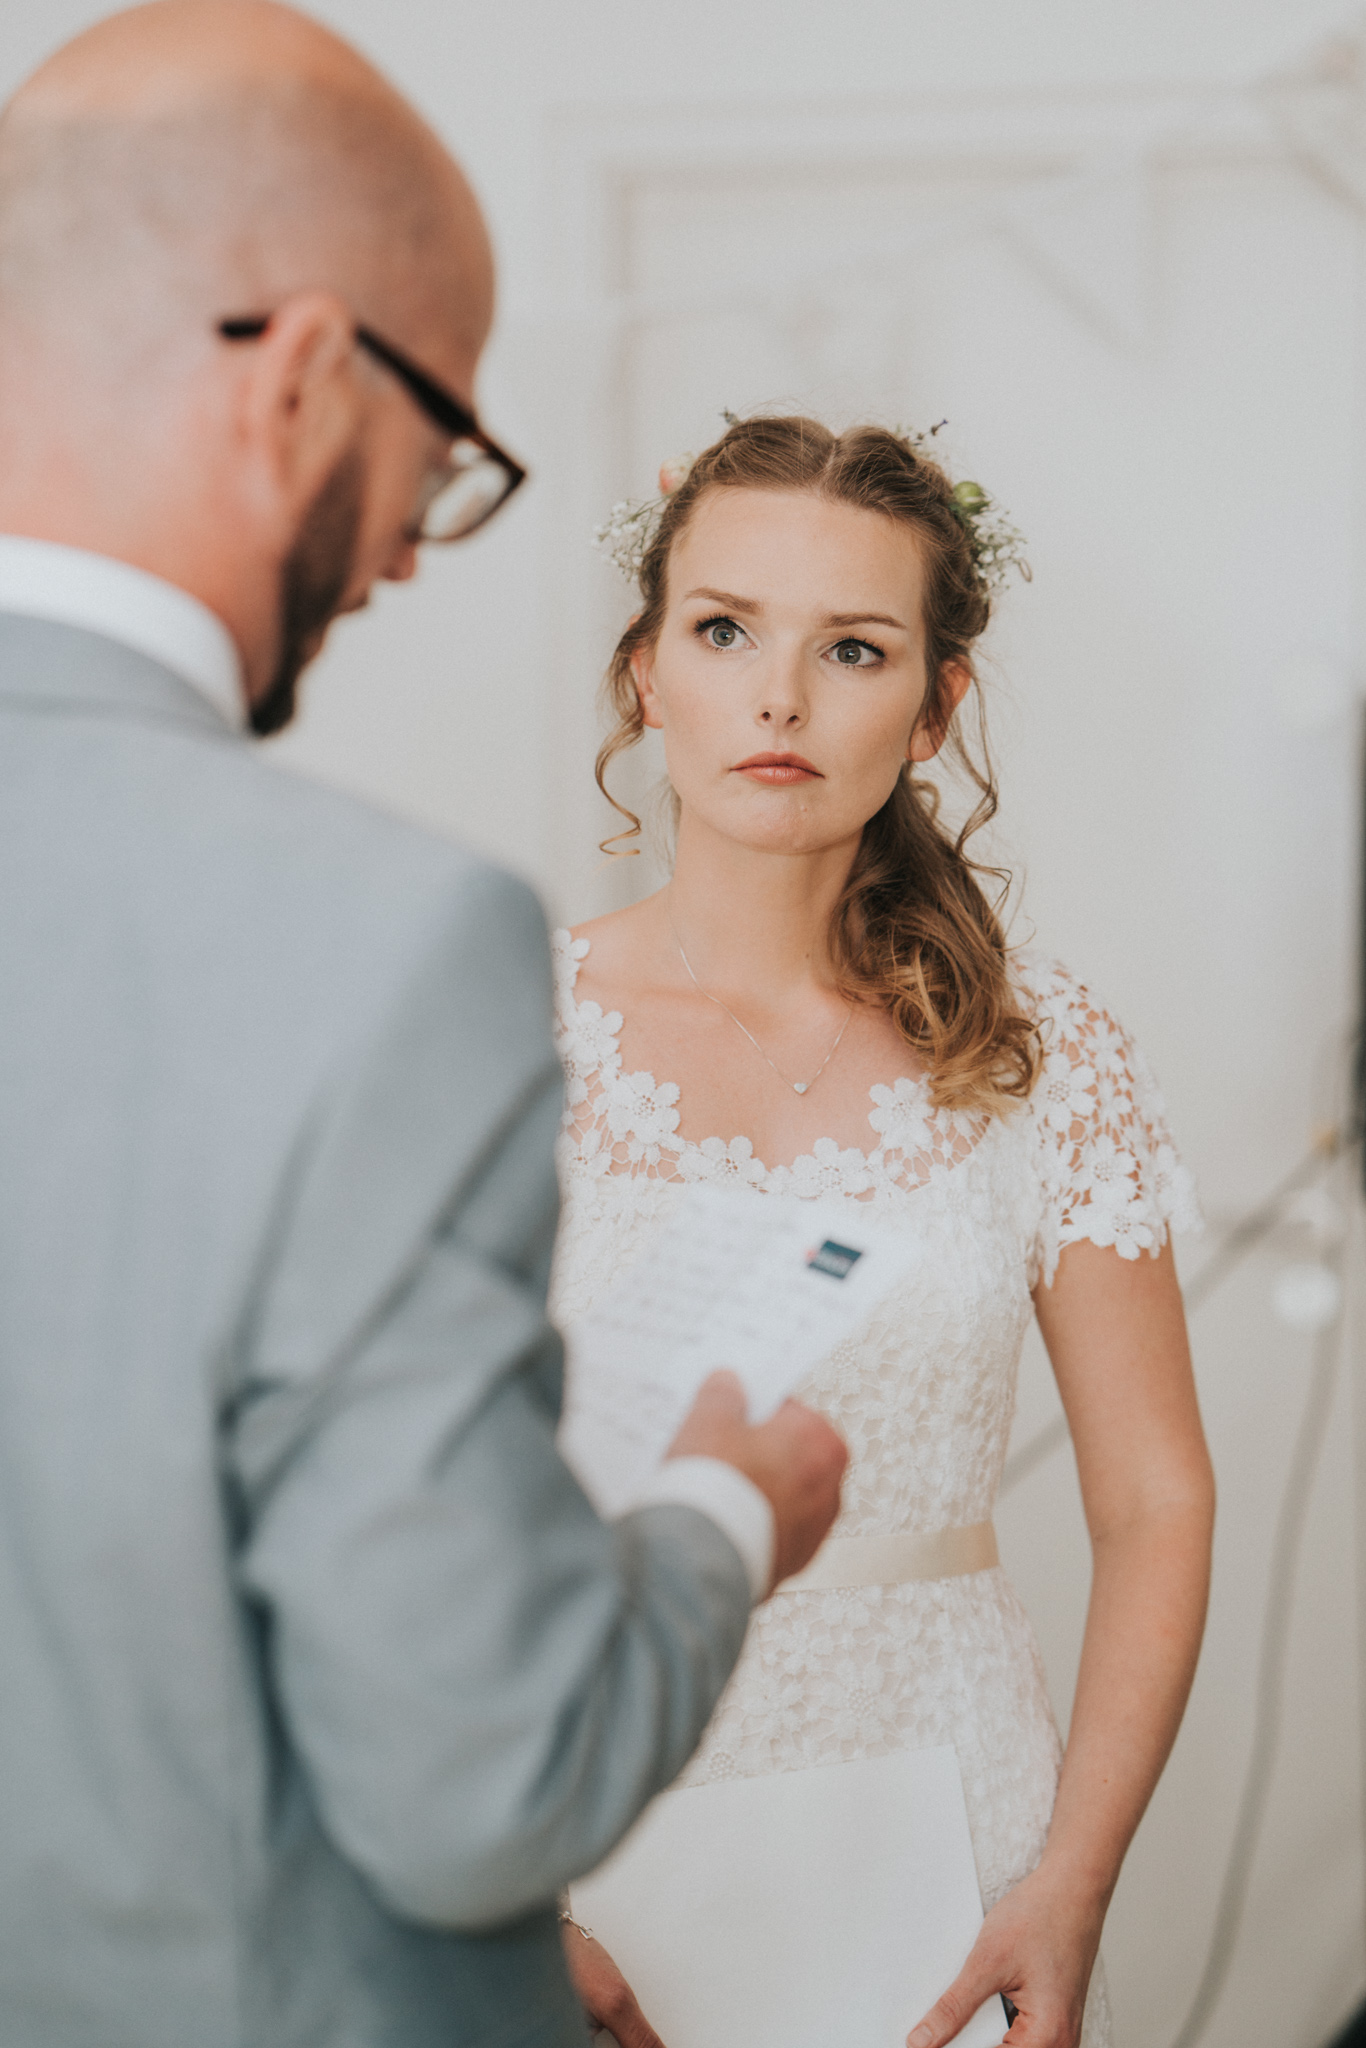 Grace-Elizabeth-Georgie-Amalaketu-Firstsite-Colchester-Essex-Boho-Buddhist-Wedding-Alternative-Wedding-Photography-Essex (53 of 100).jpg